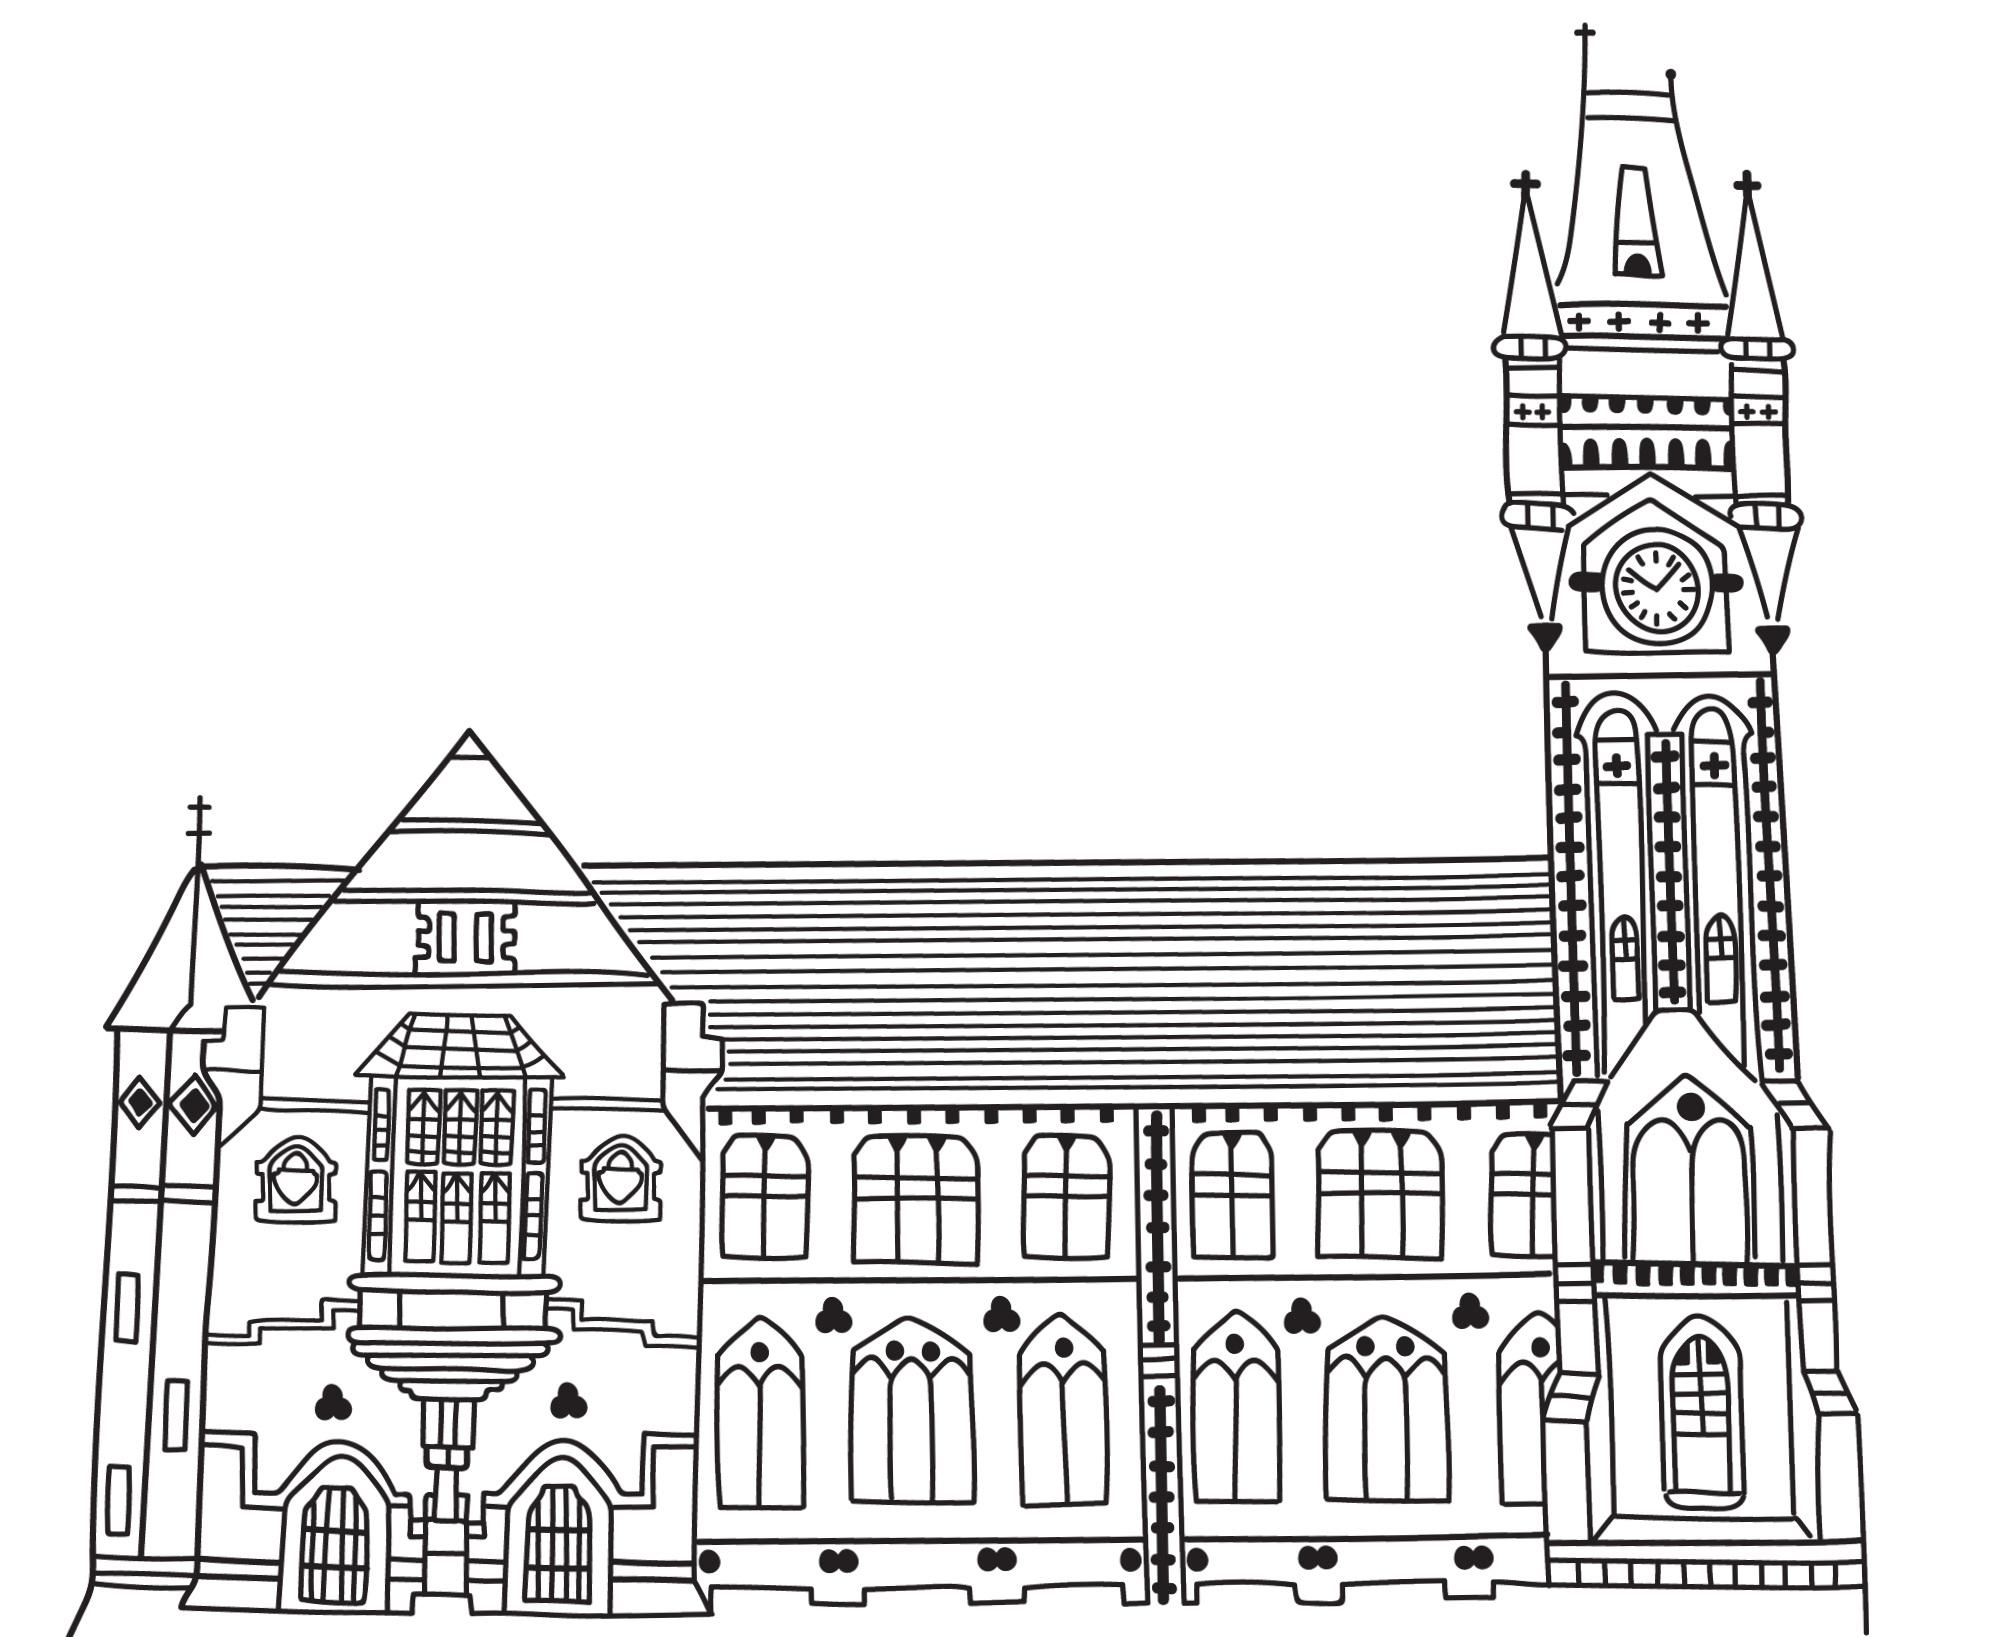 Clocktower+Sketch+.jpg